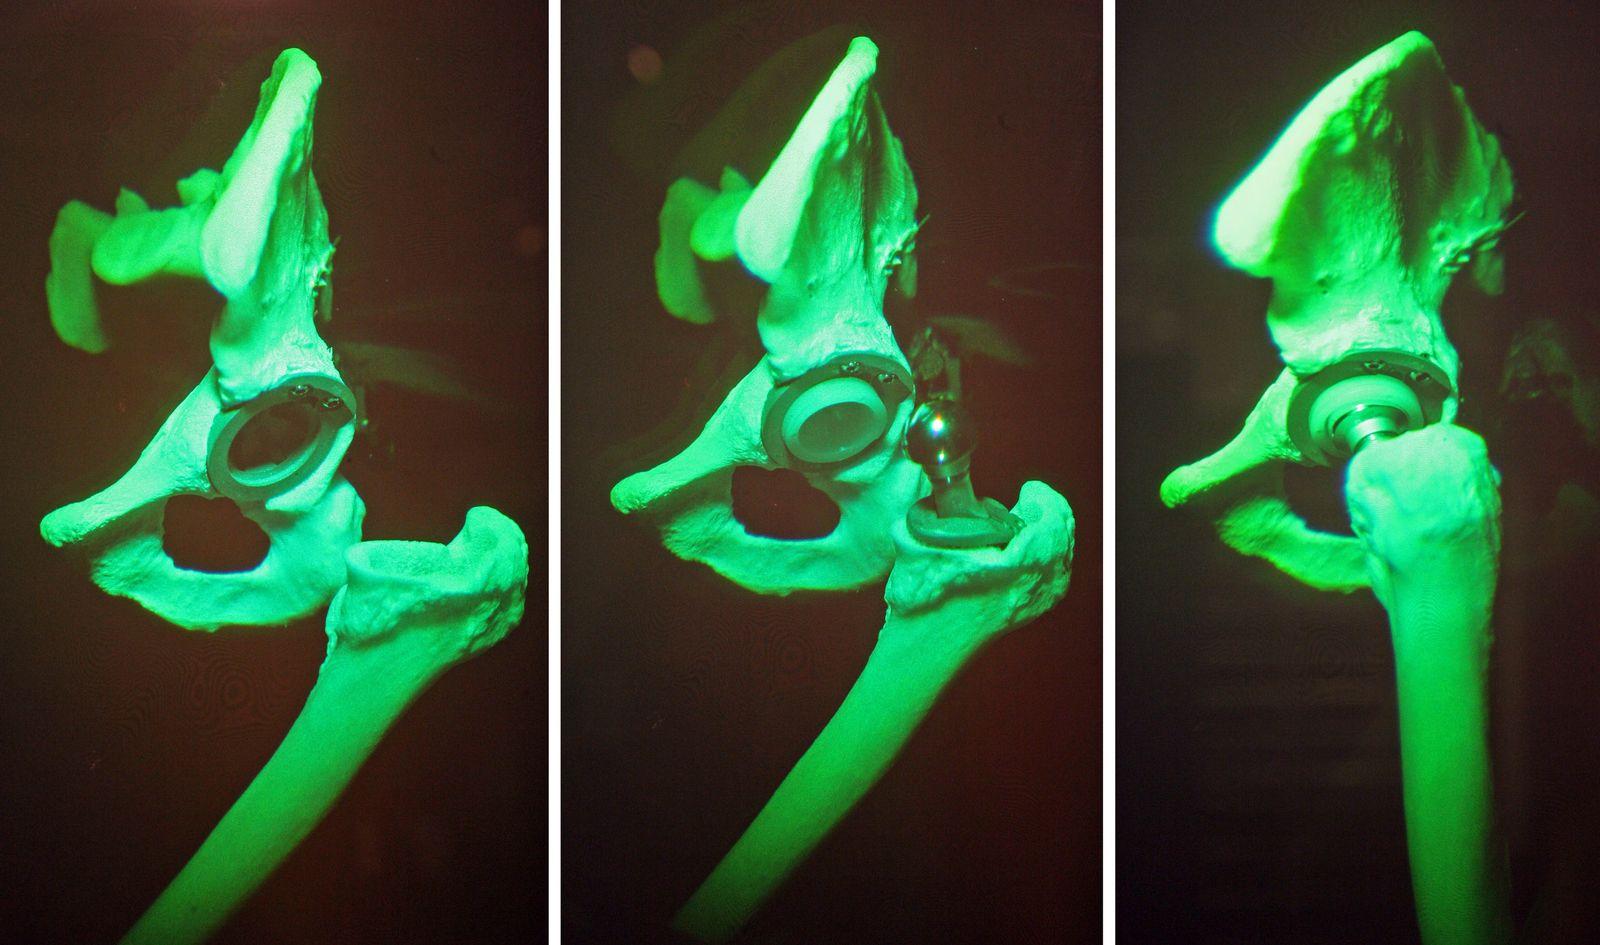 Hüftprothese Hüftimplantate